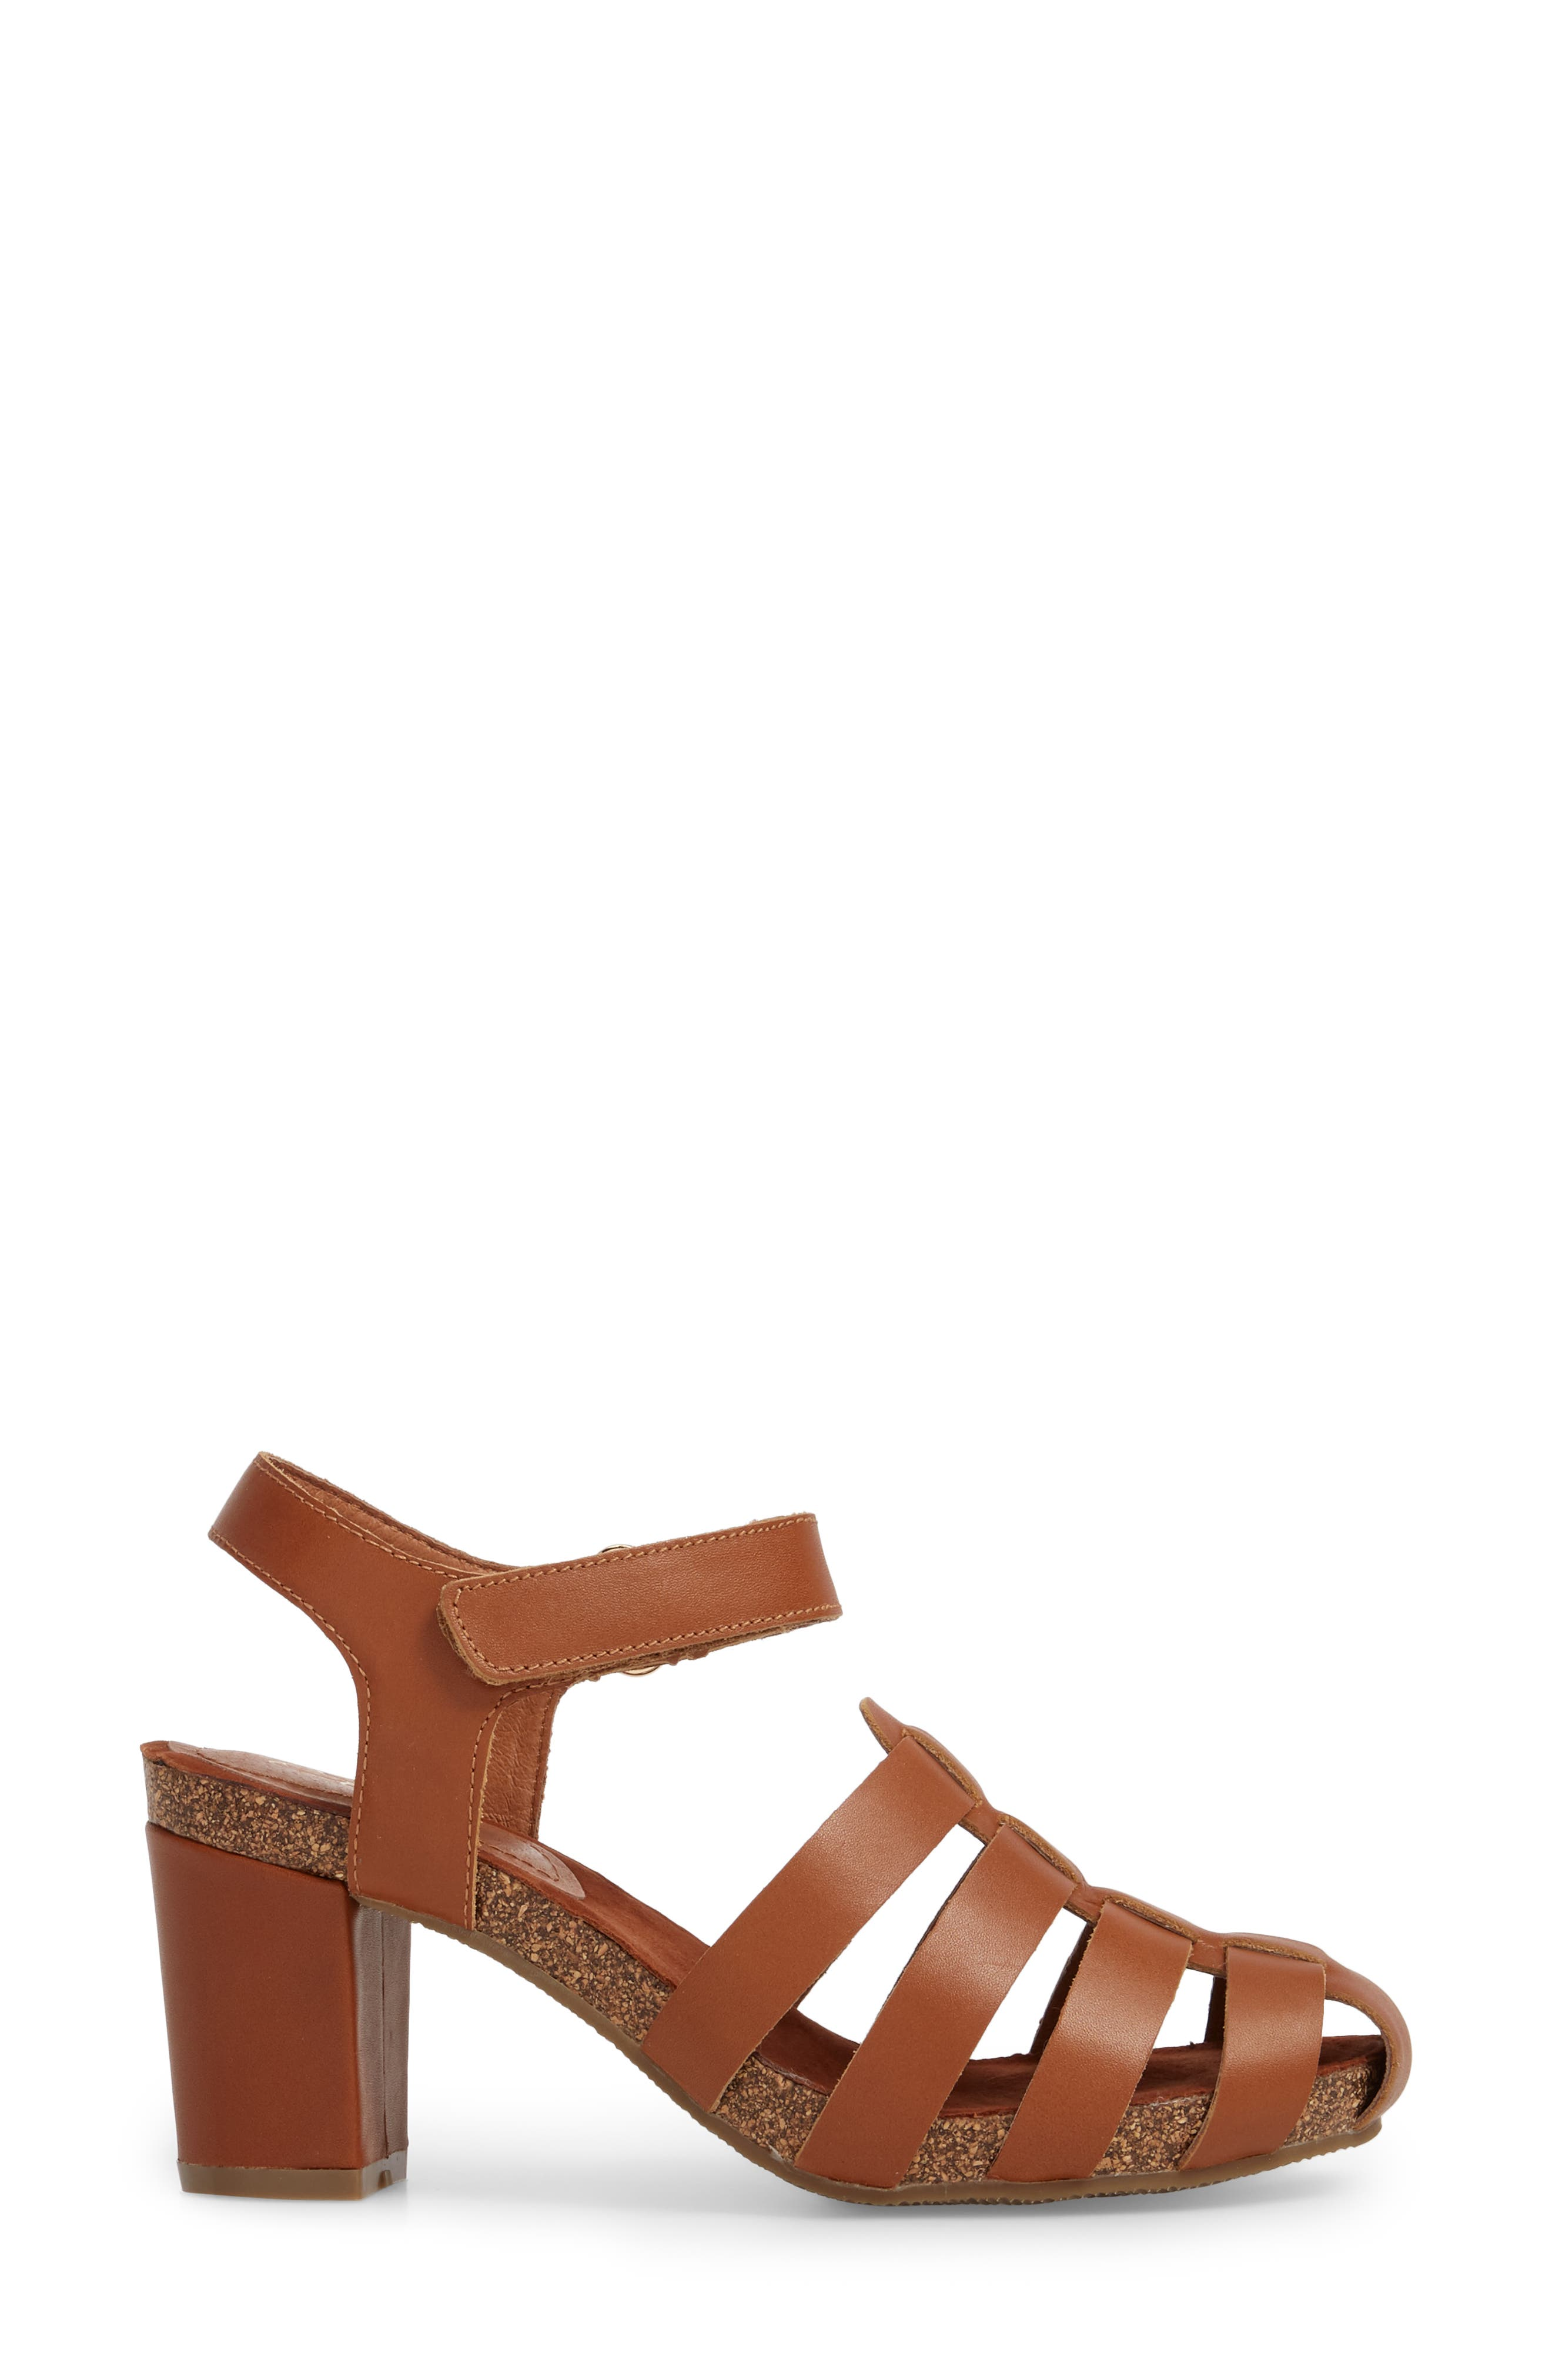 Carrara Block Heel Sandal,                             Alternate thumbnail 3, color,                             Cognac Leather